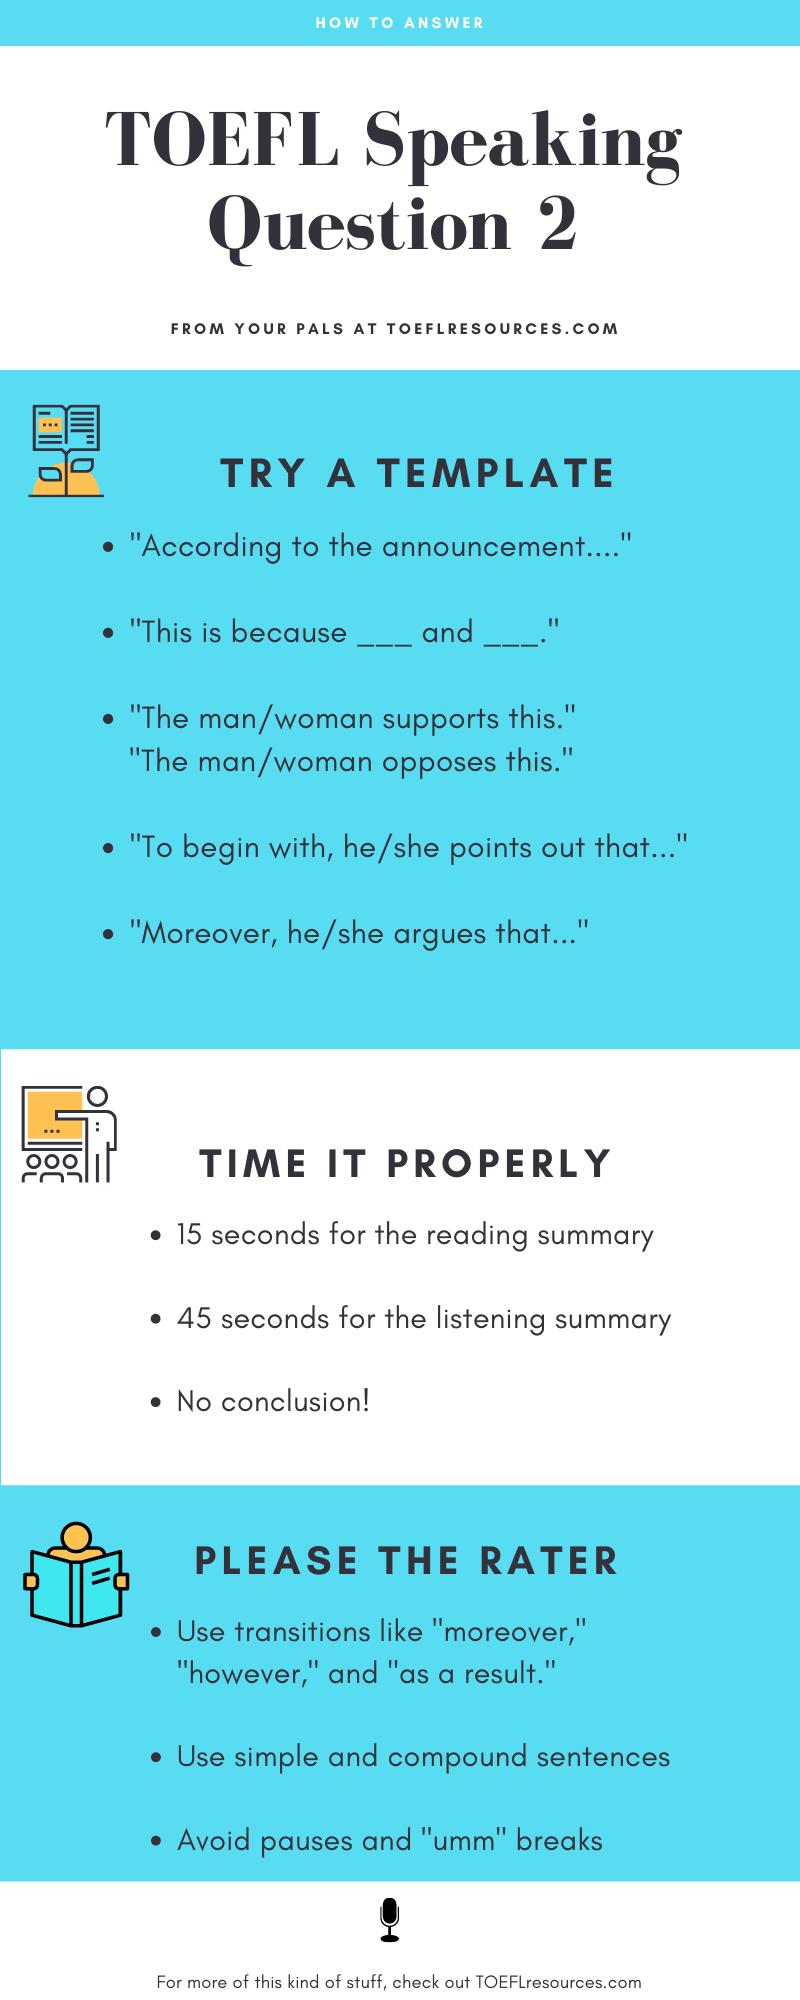 TOEFL speaking Question 2